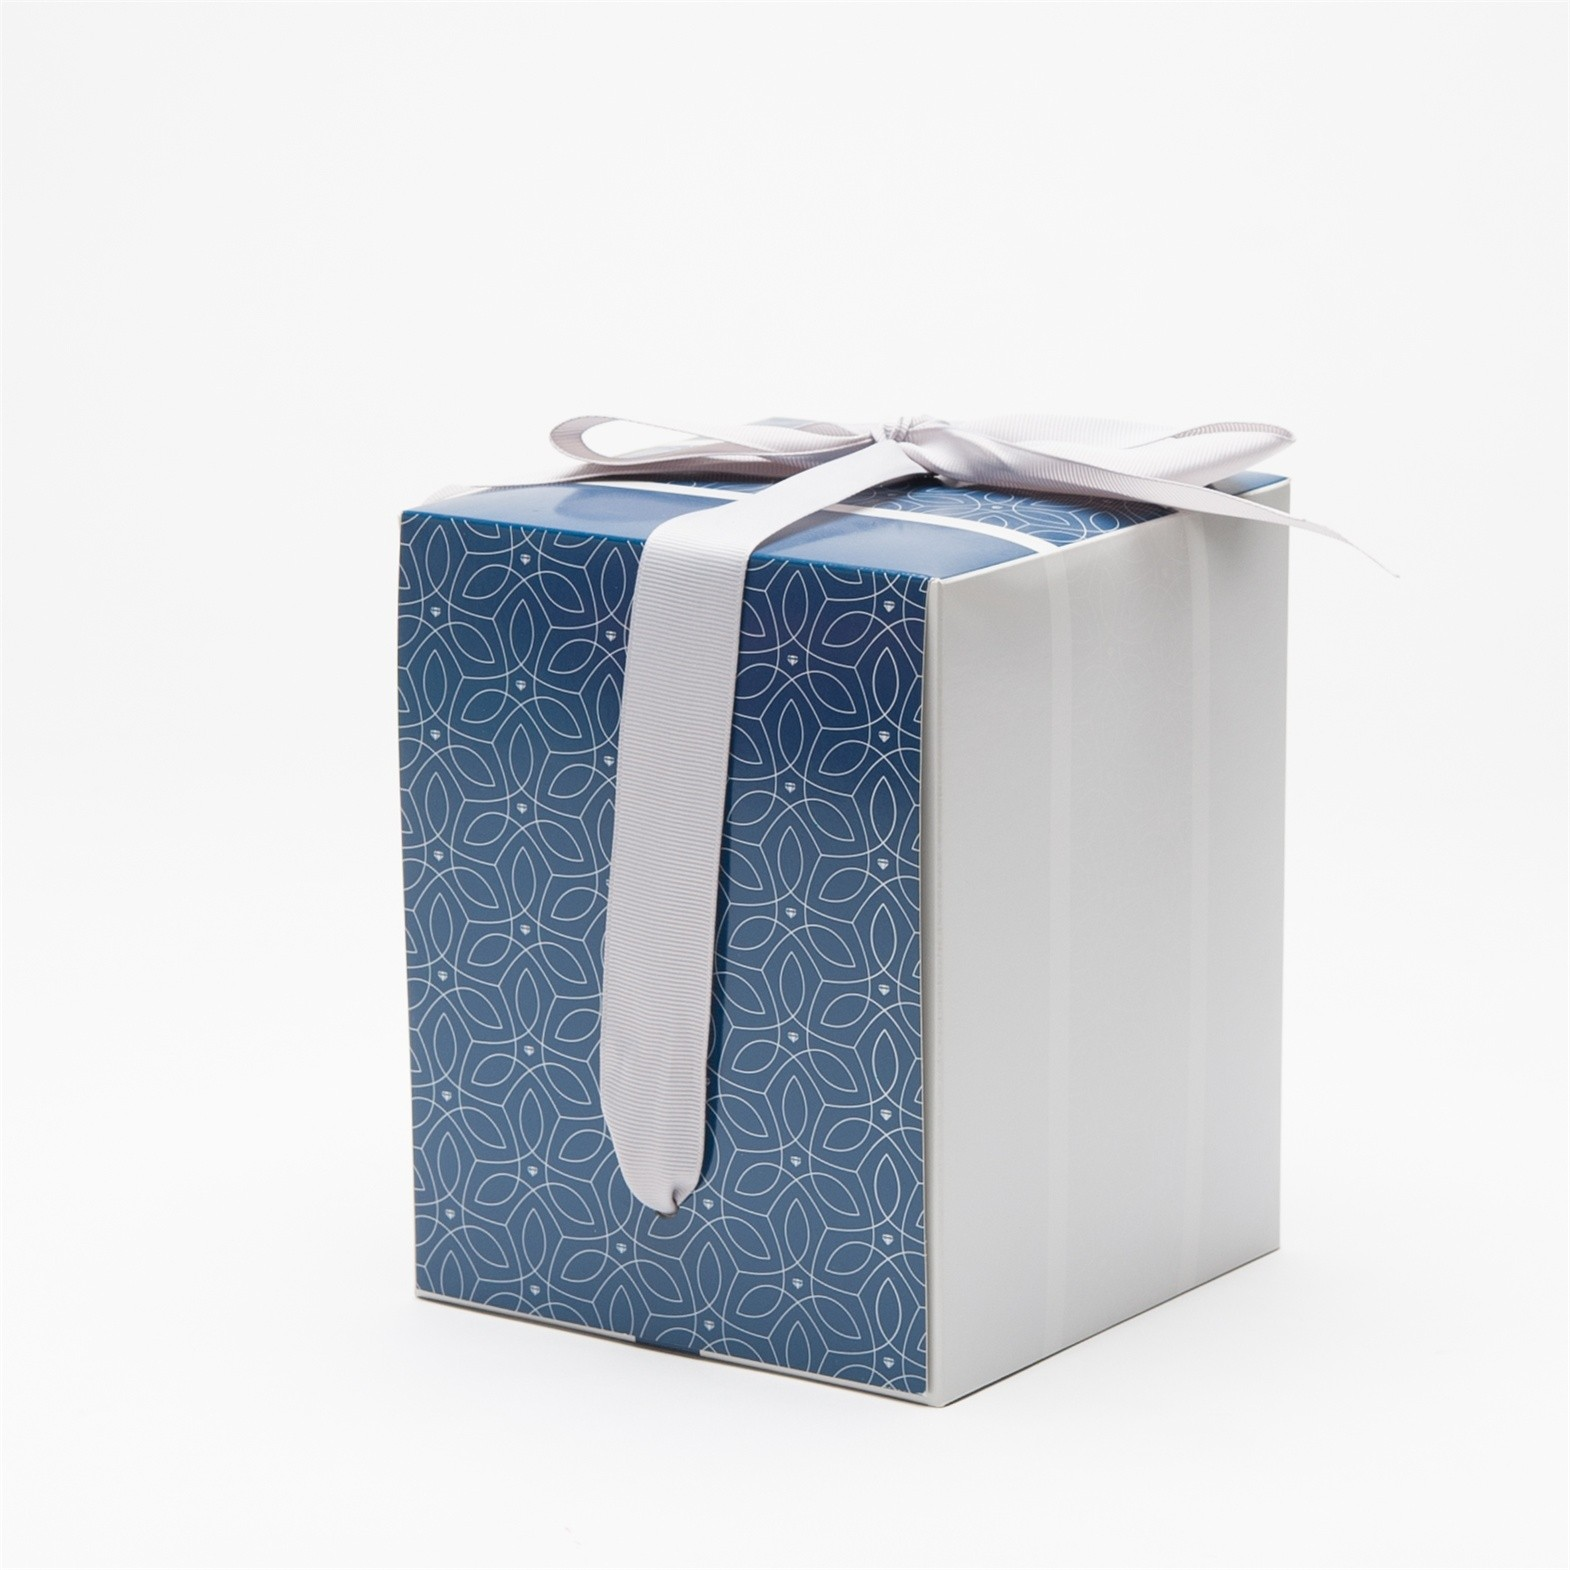 Guangjin -Custom Shipping Boxes, Custom Made Gift Boxes Manufacturer | Paper Box